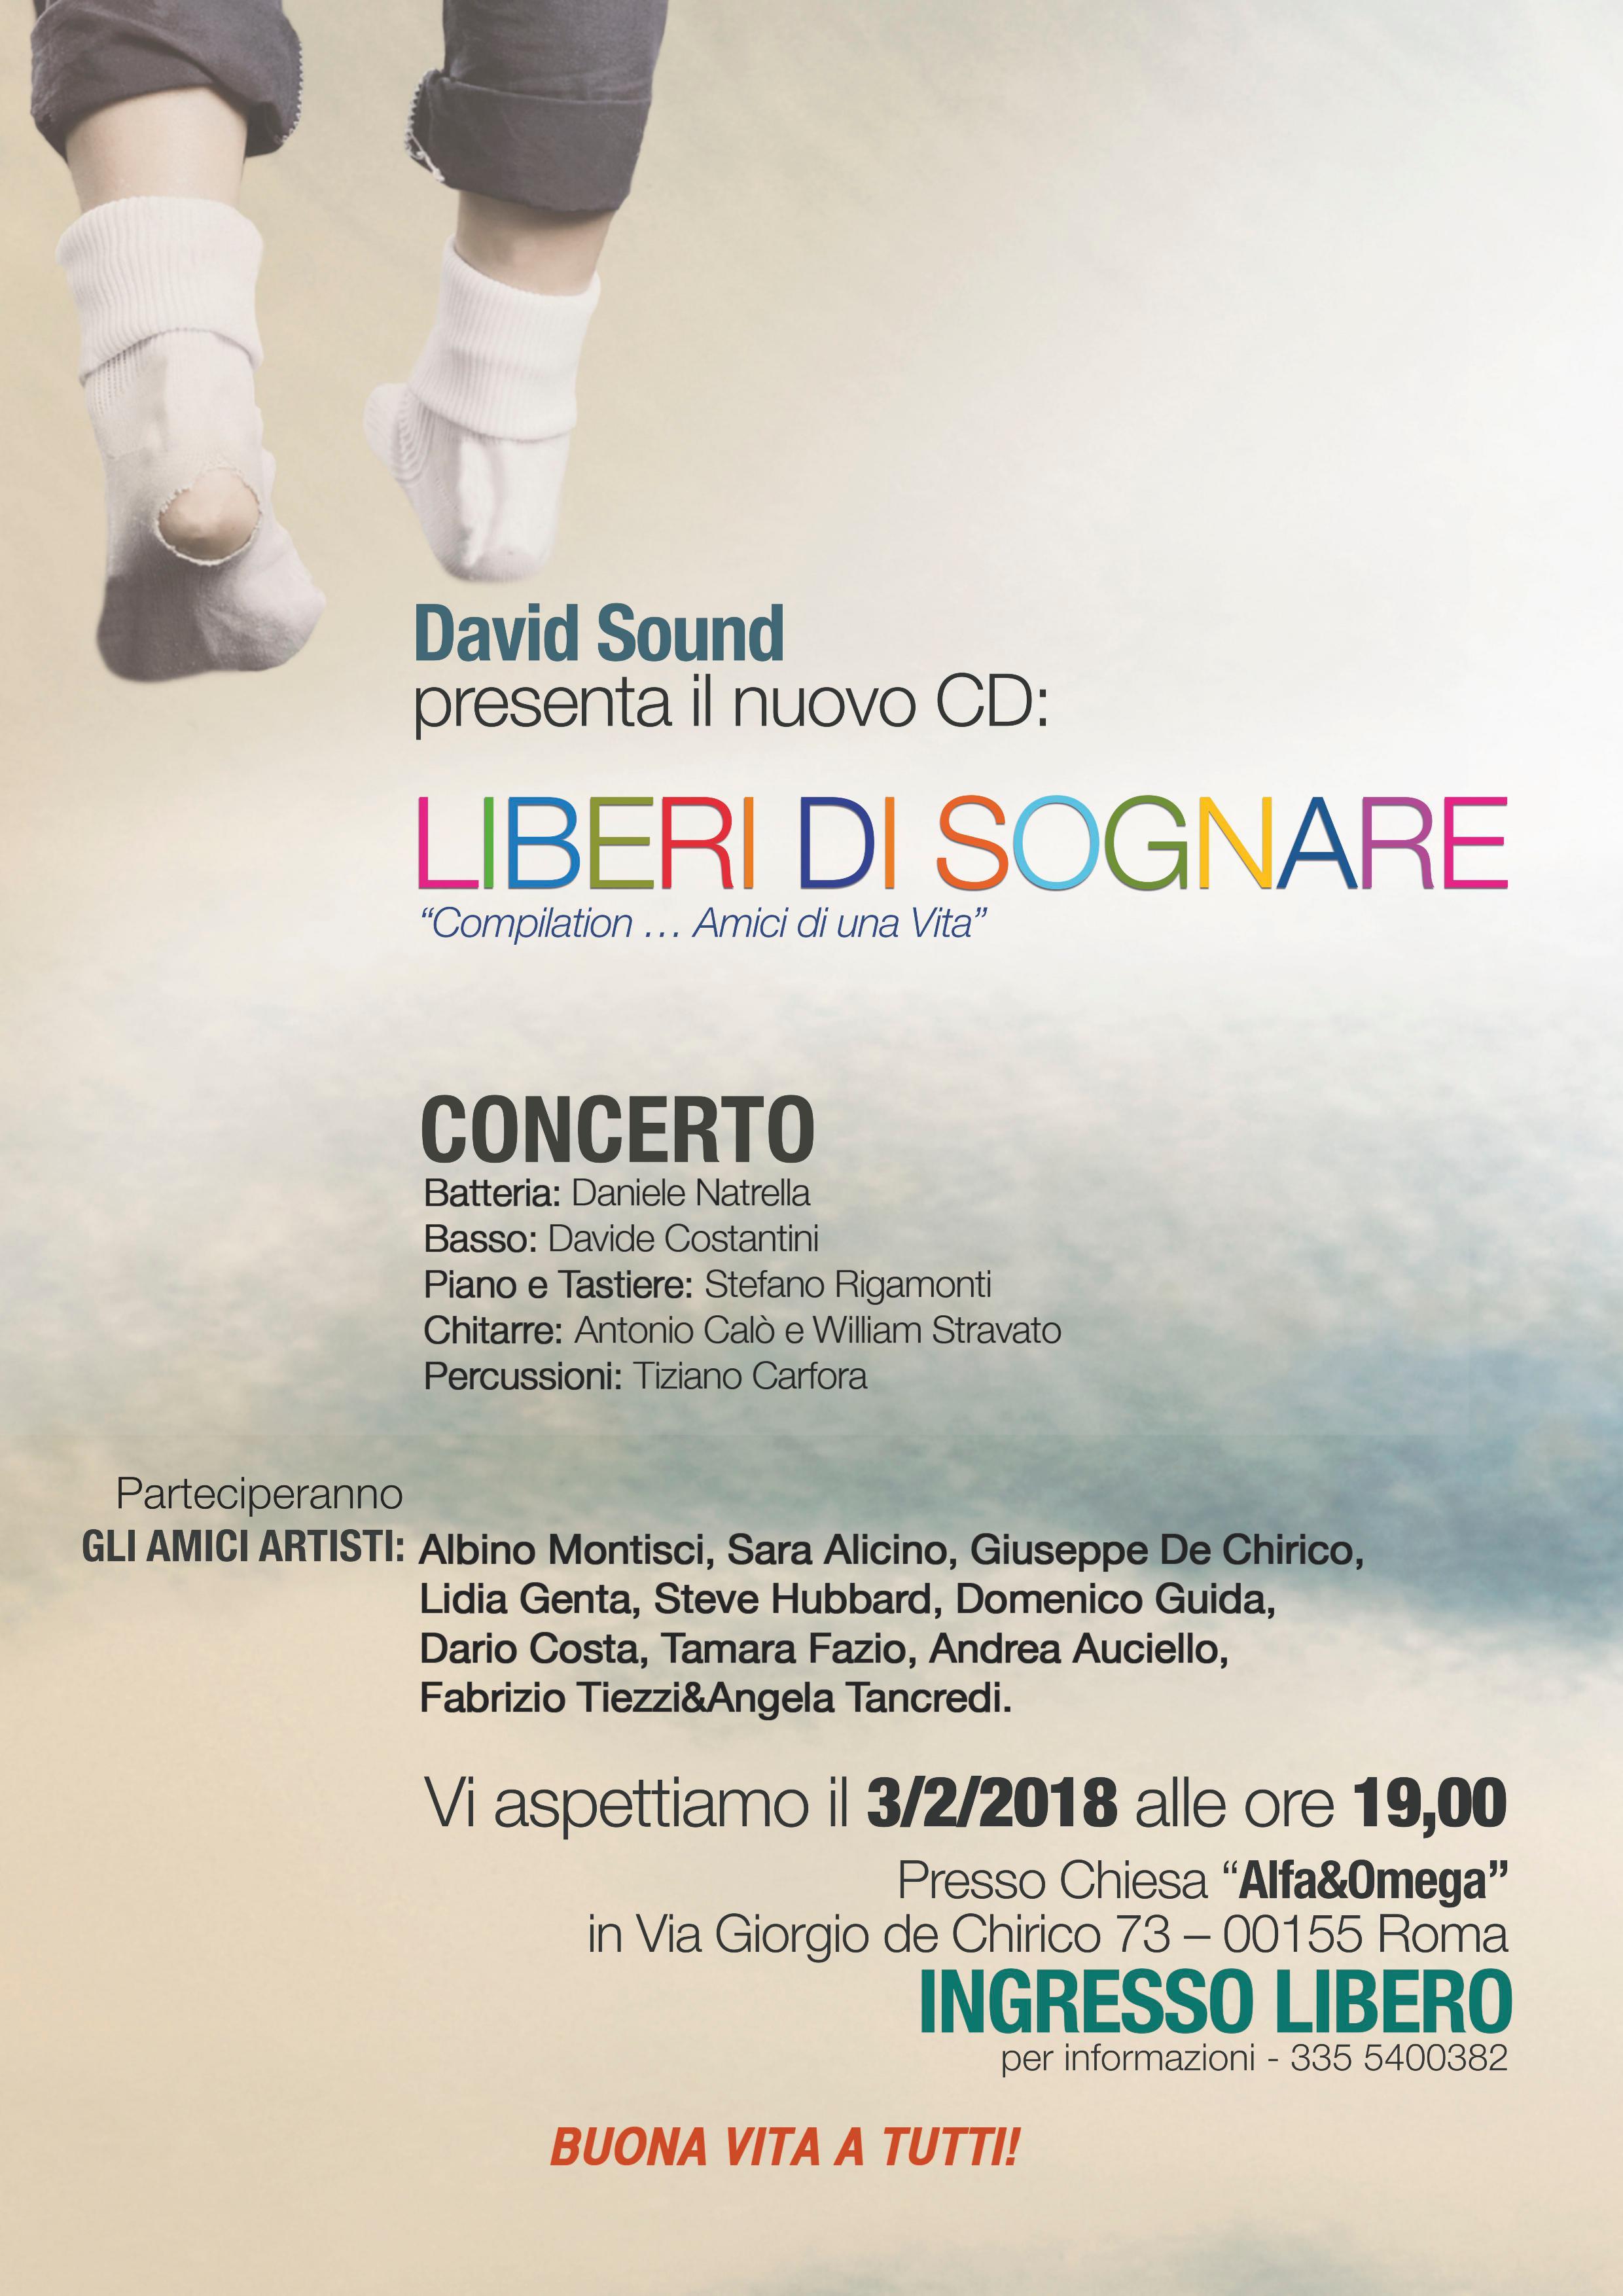 Roma 3/2/2018 ore 19